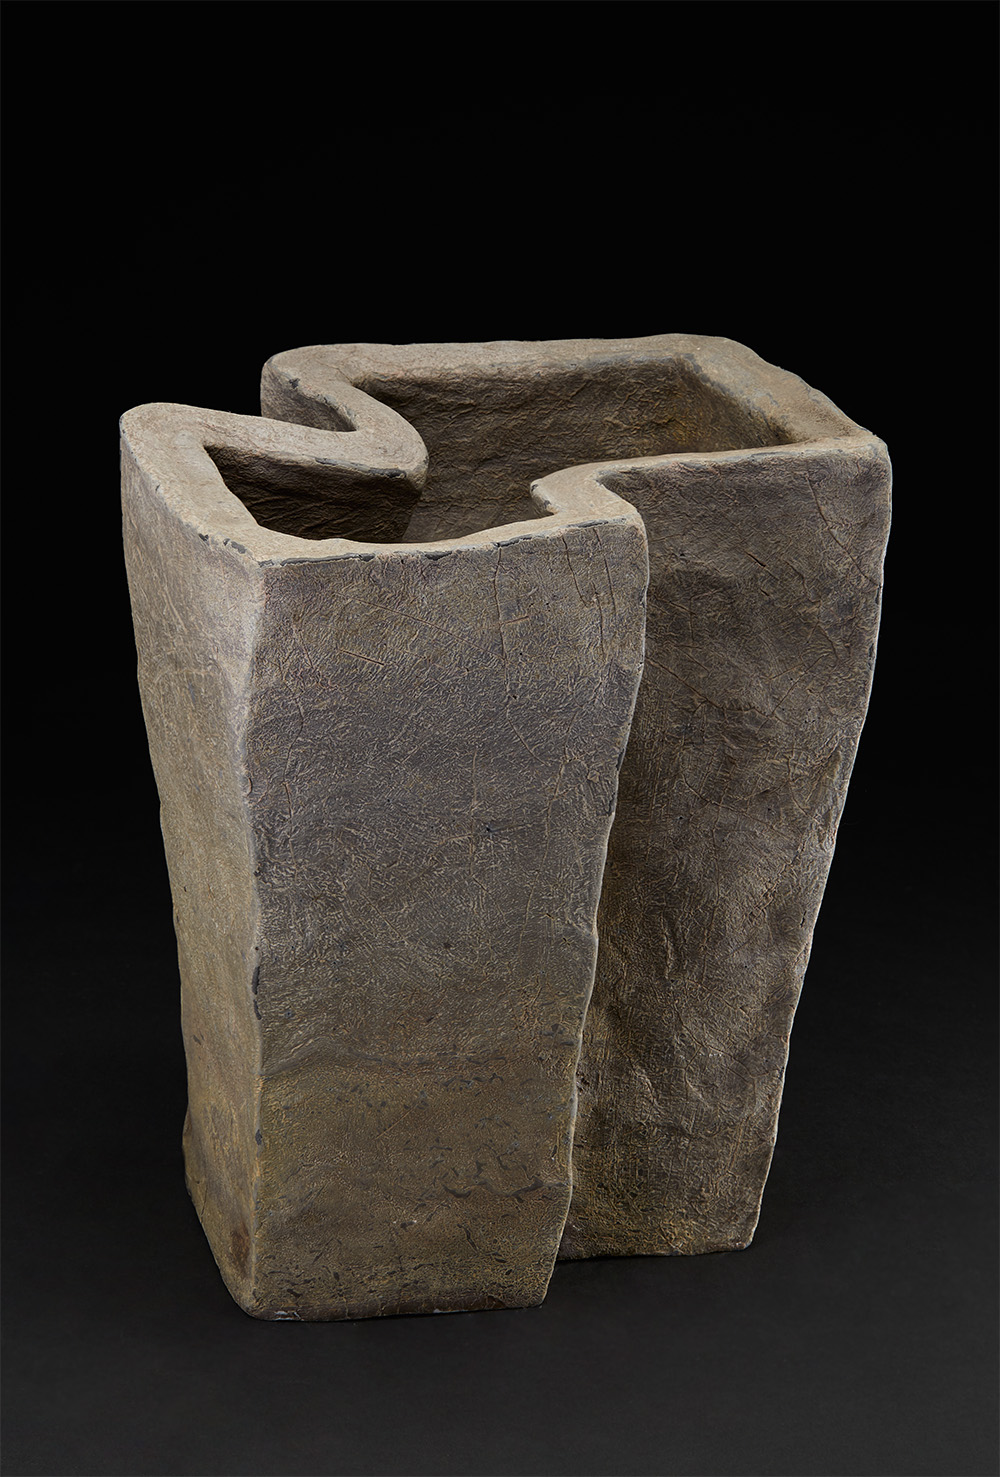 Tim Rowan  Untitled  , 2004 Fired ceramic 10 x 11 x 8 inches 25.4 x 27.9 x 20.3 cm TR 7